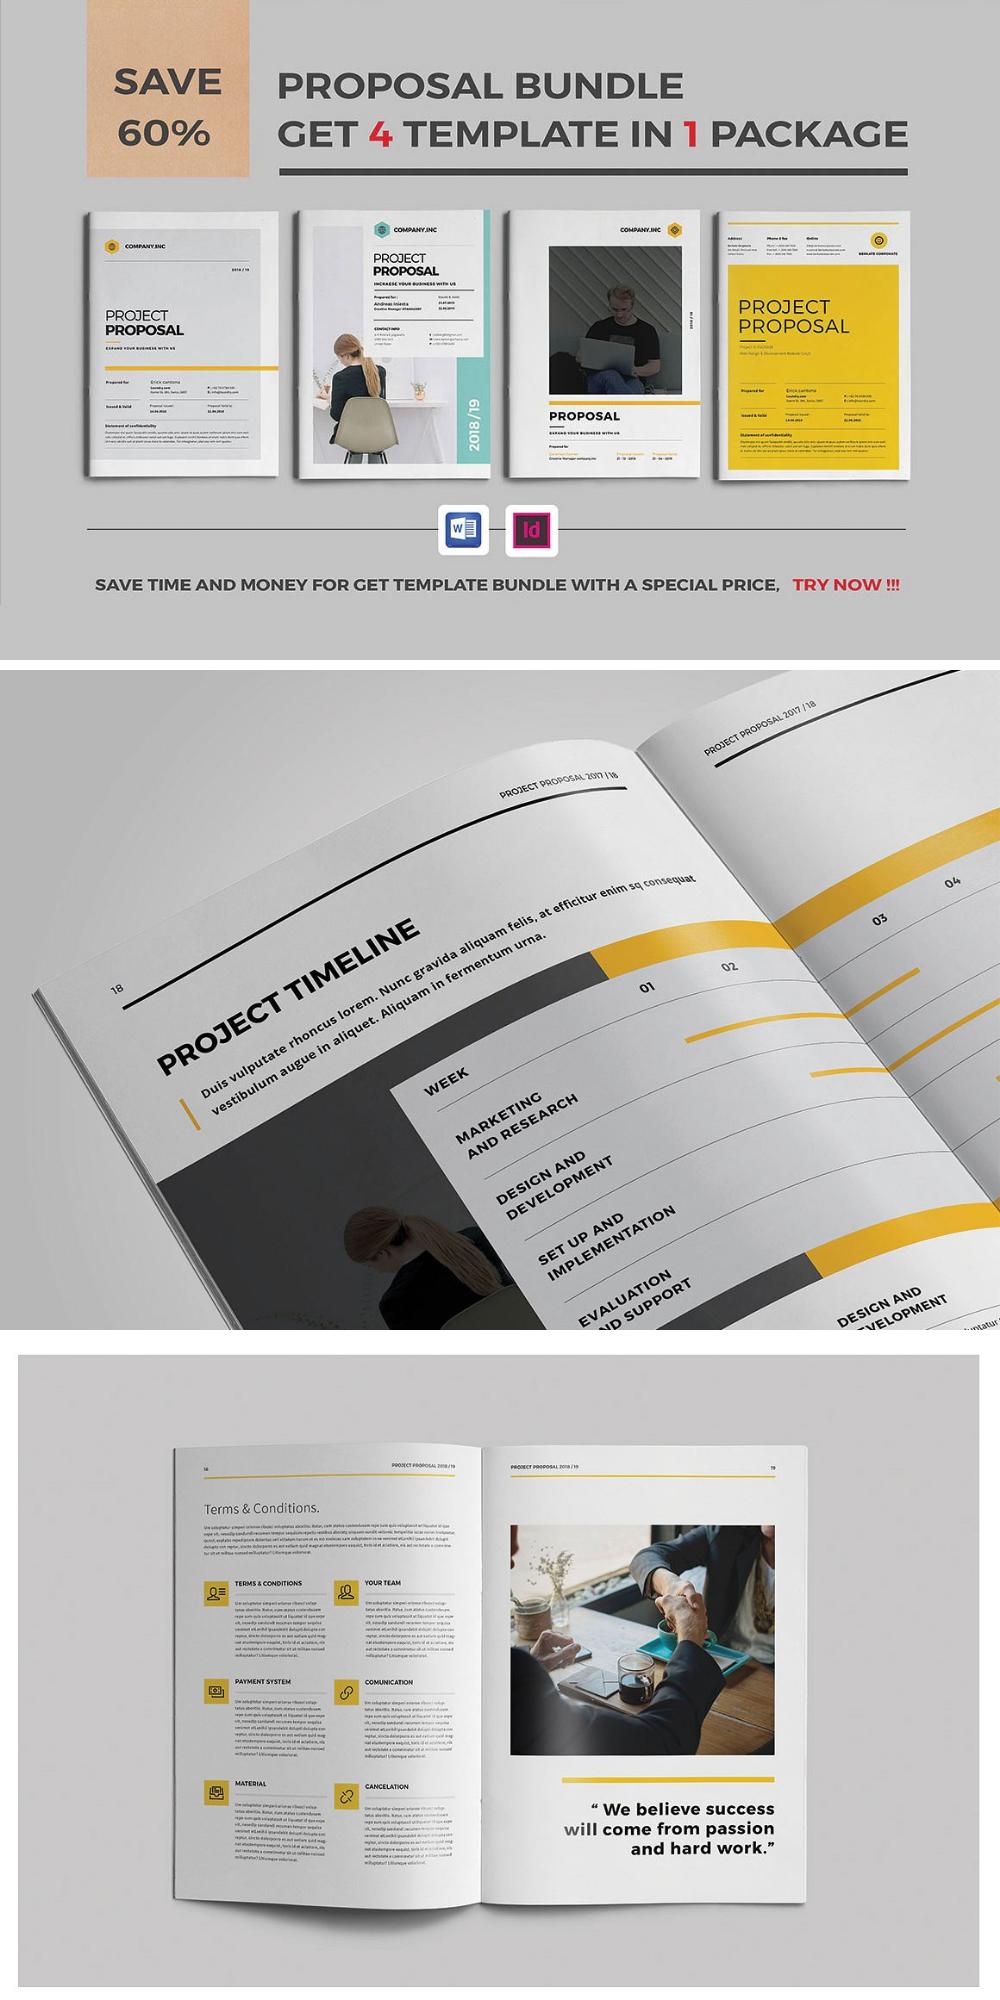 Proposal Bundle Indesign Templates Portfolio Template Design Templates